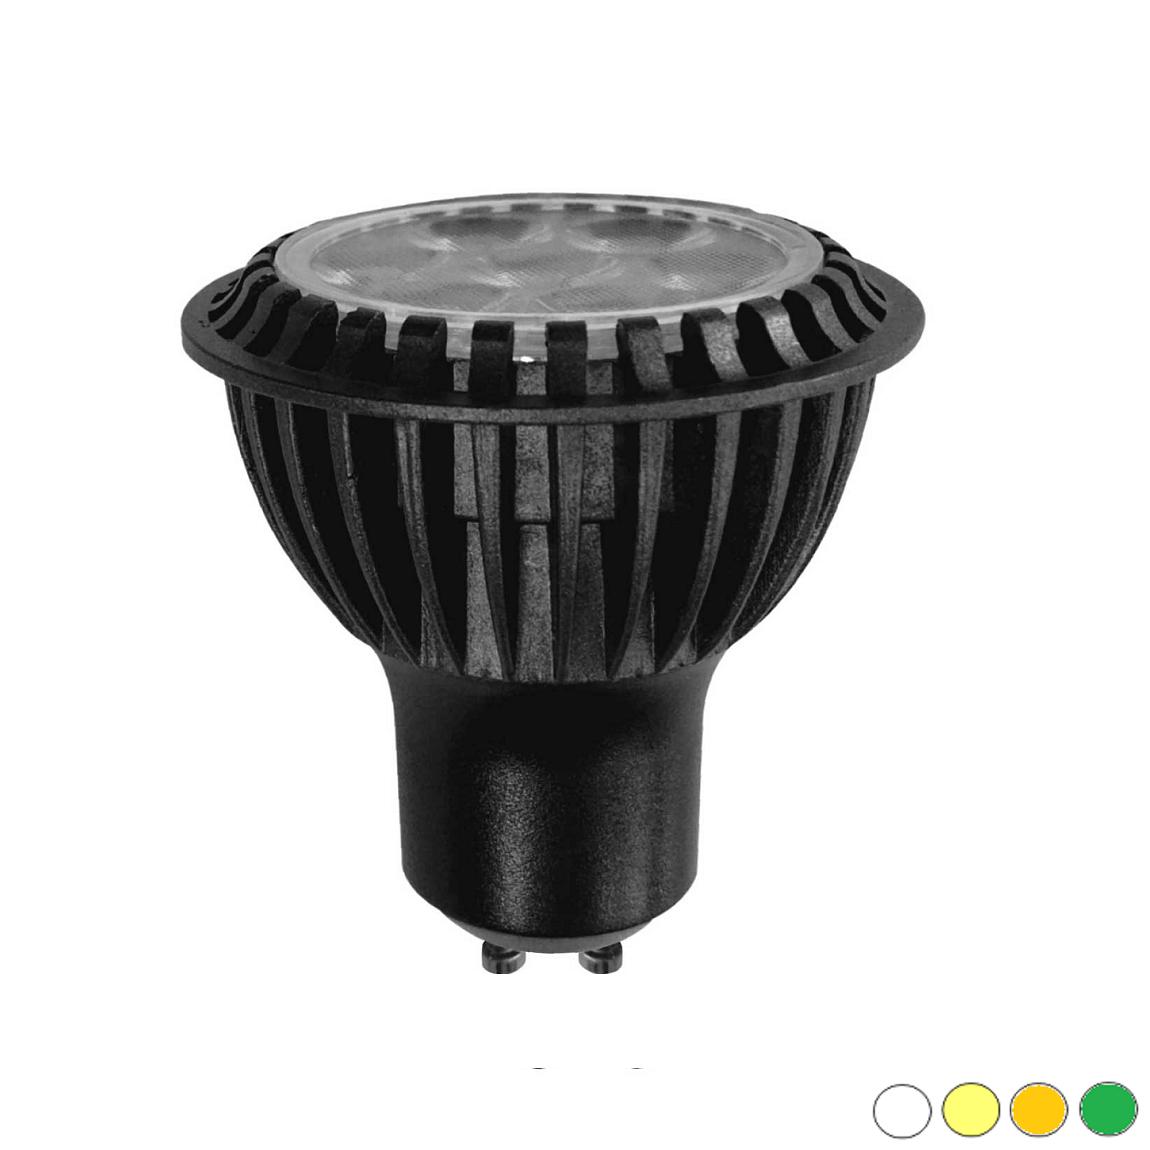 FORLIFE FL-1653-G - GU10 Duylu 7 Watt LED Spot Ampulü